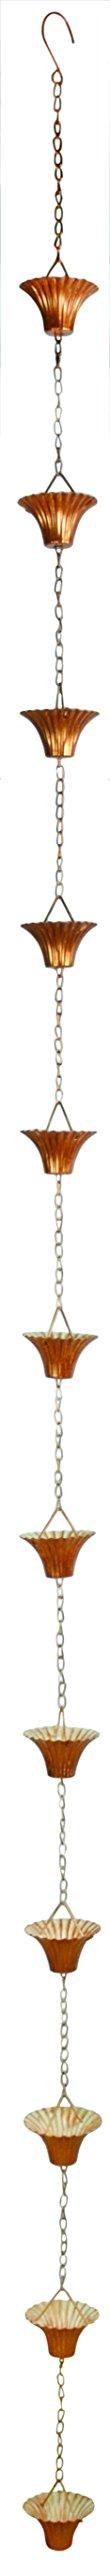 Esschert Design TH87 Series Copper Plated Rain Chain